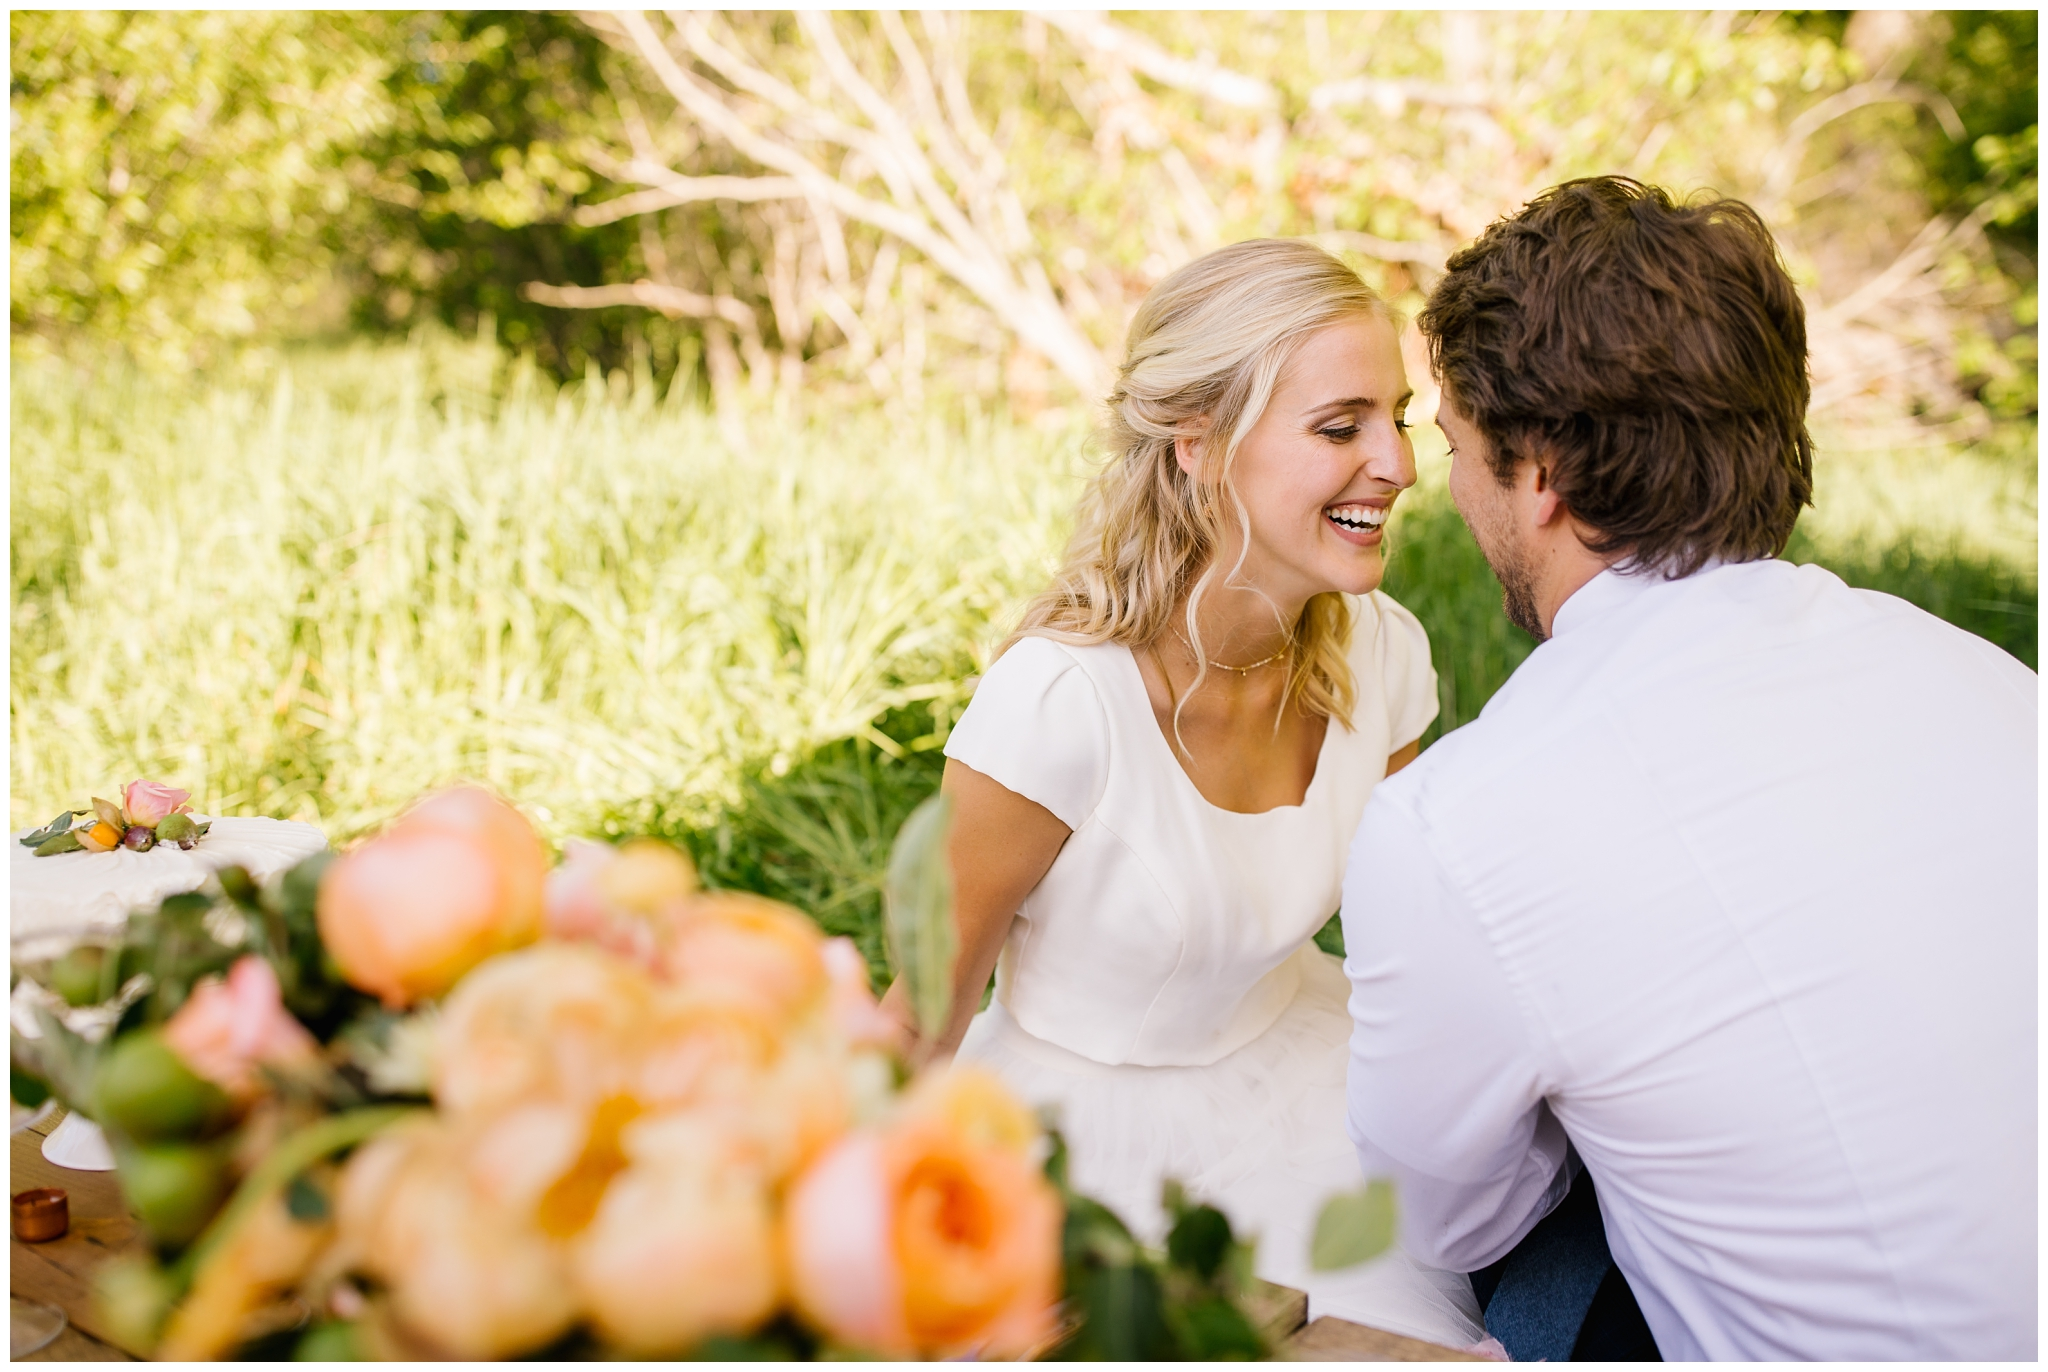 Lizzie-B-Imagery-Utah-Wedding-Photographer-Park-City-Photographer_0031.jpg